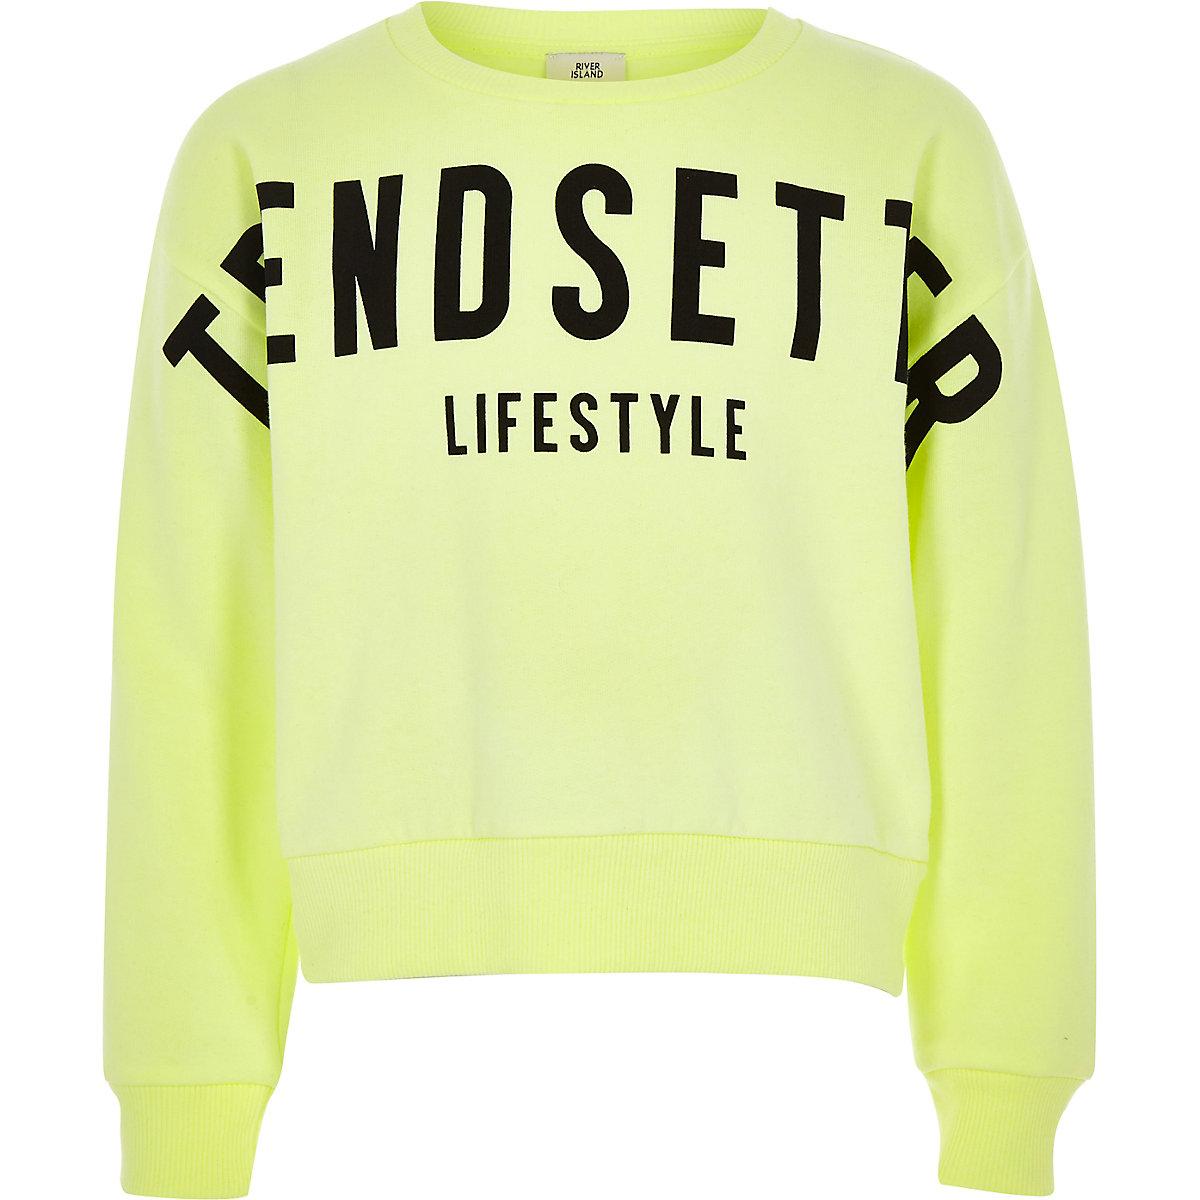 Girls bright green 'Trendsetter' sweatshirt